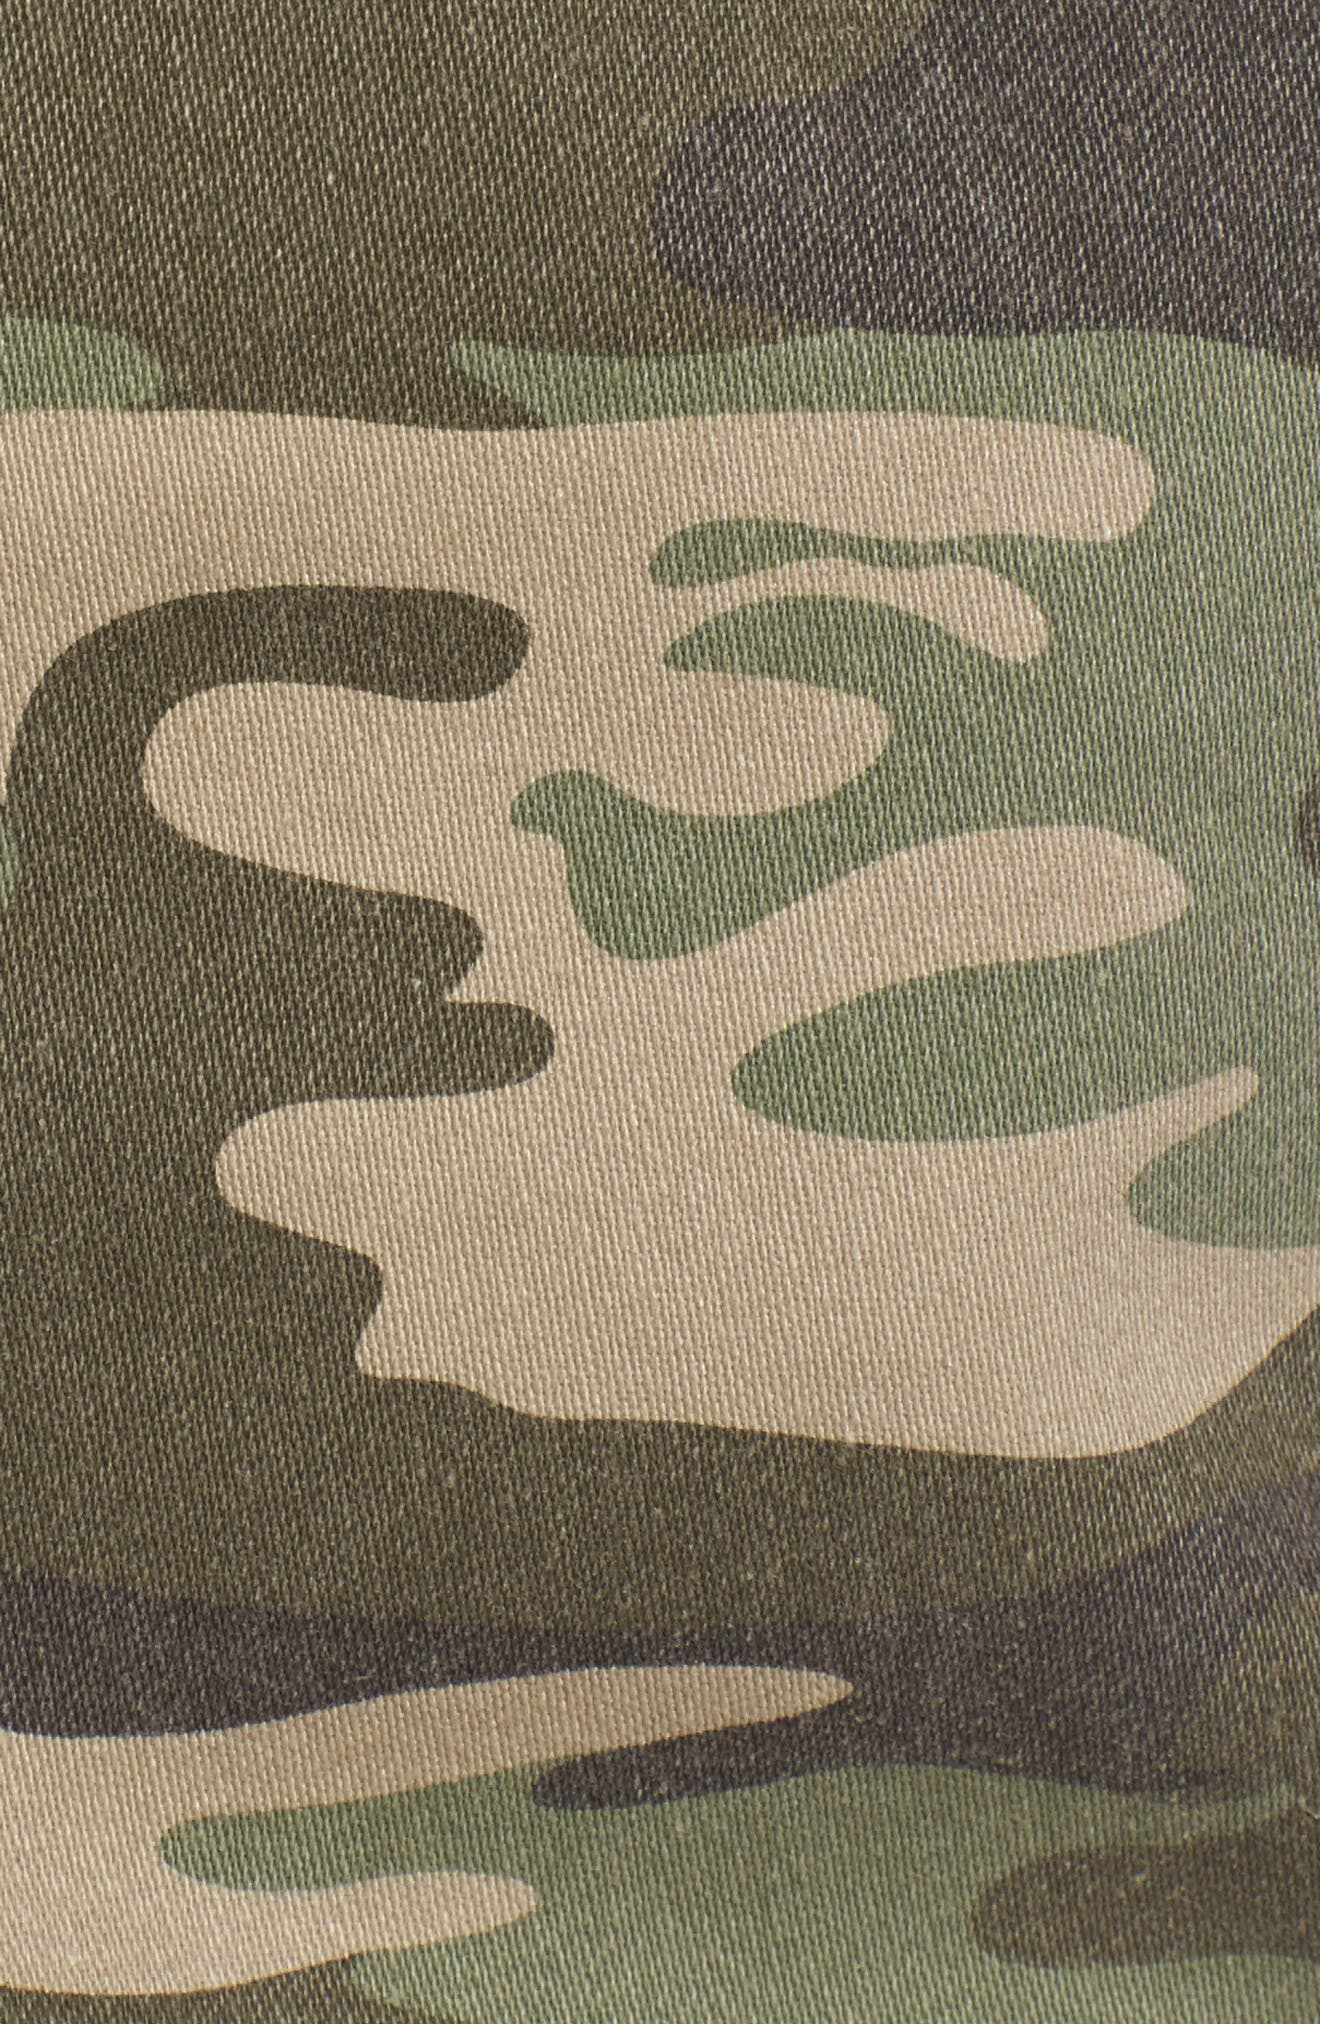 Safari Camo Skirt,                             Alternate thumbnail 5, color,                             393